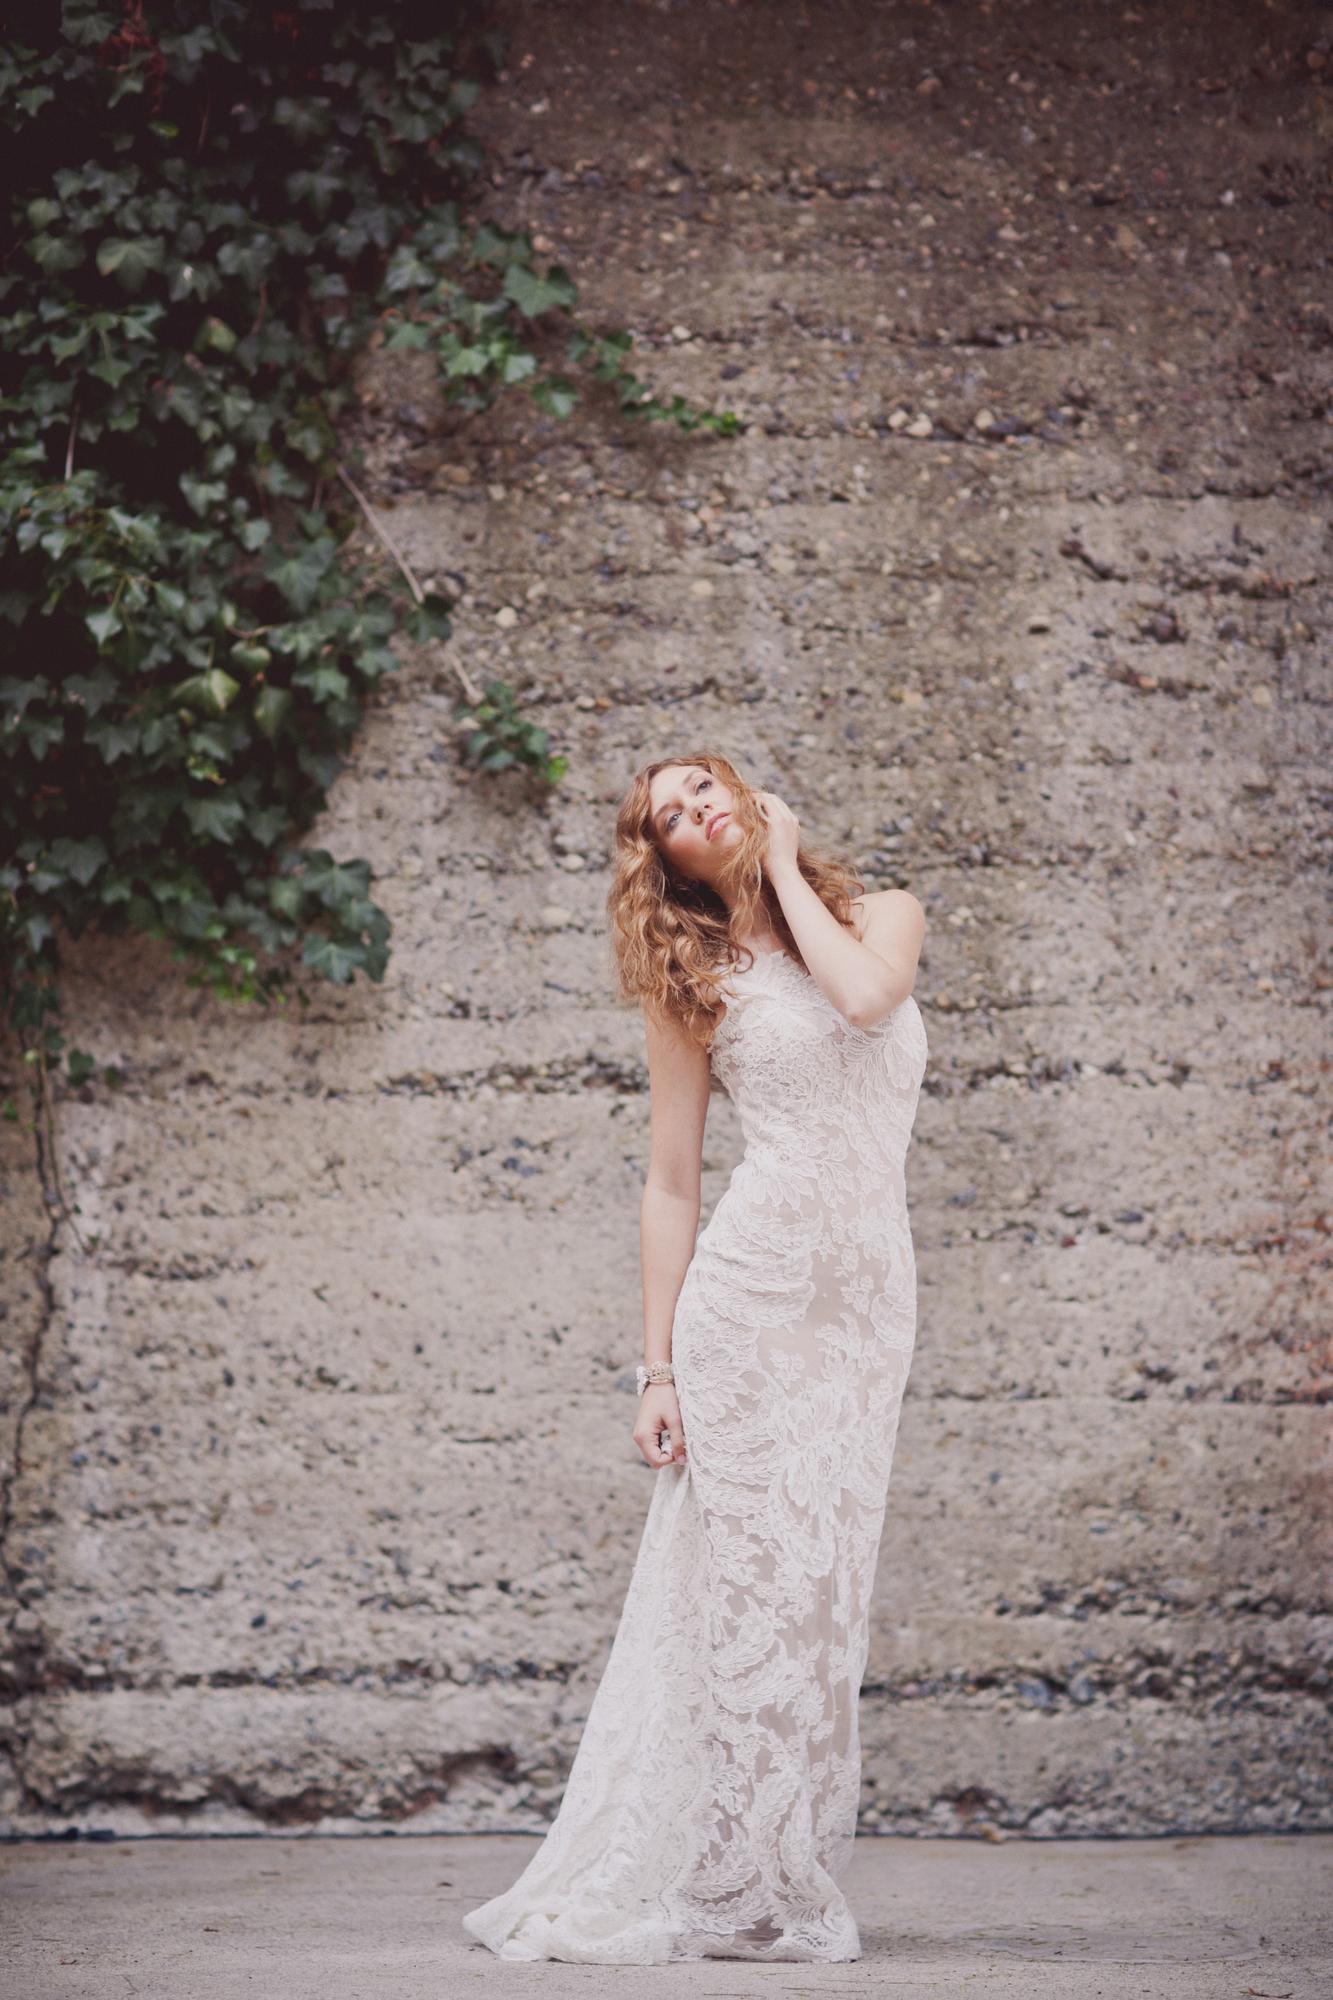 jennifer-skog-bridal-fashion-photographer-lifestyle-0007.jpg